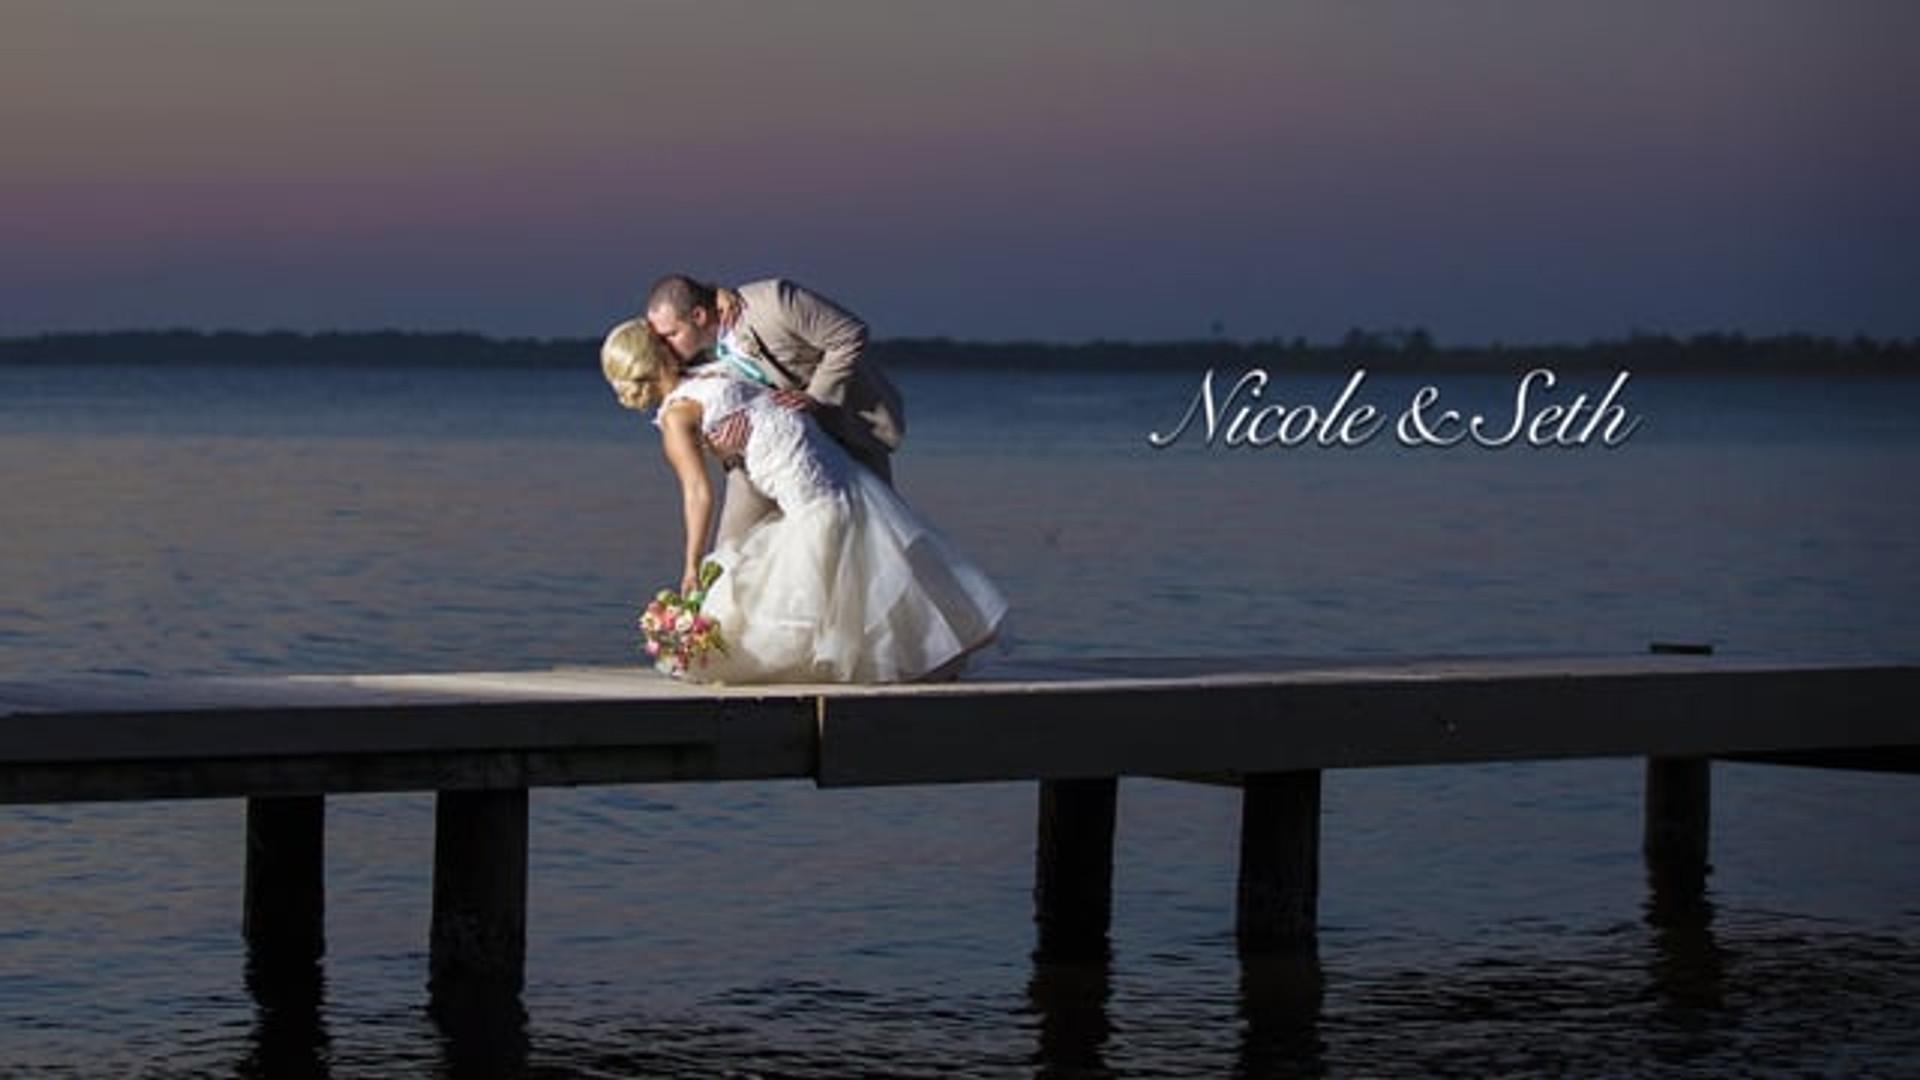 Nicole & Seth